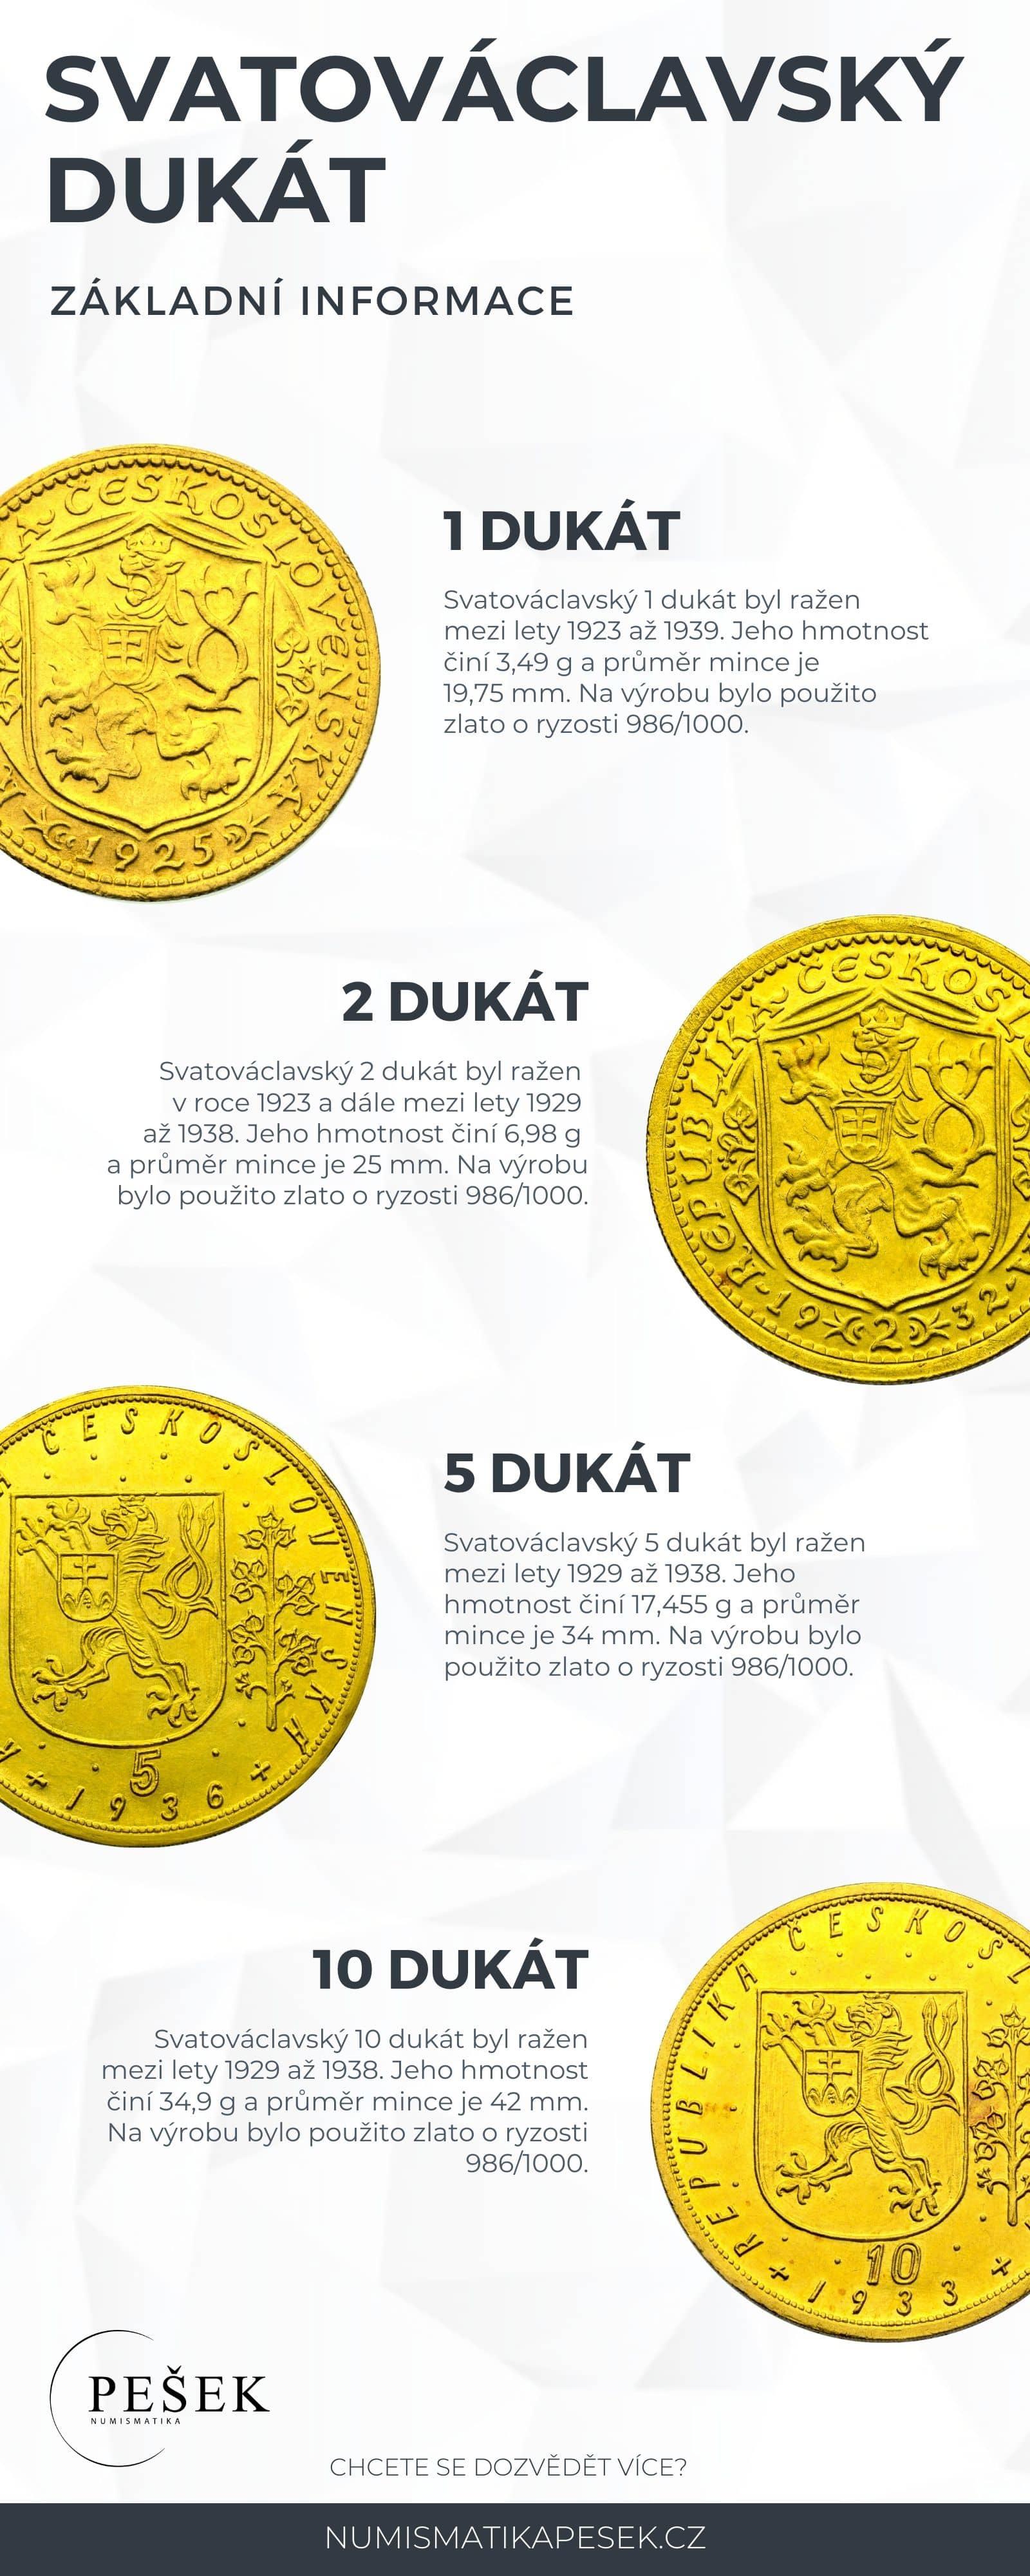 svatovaclavsky-dukat-infografika